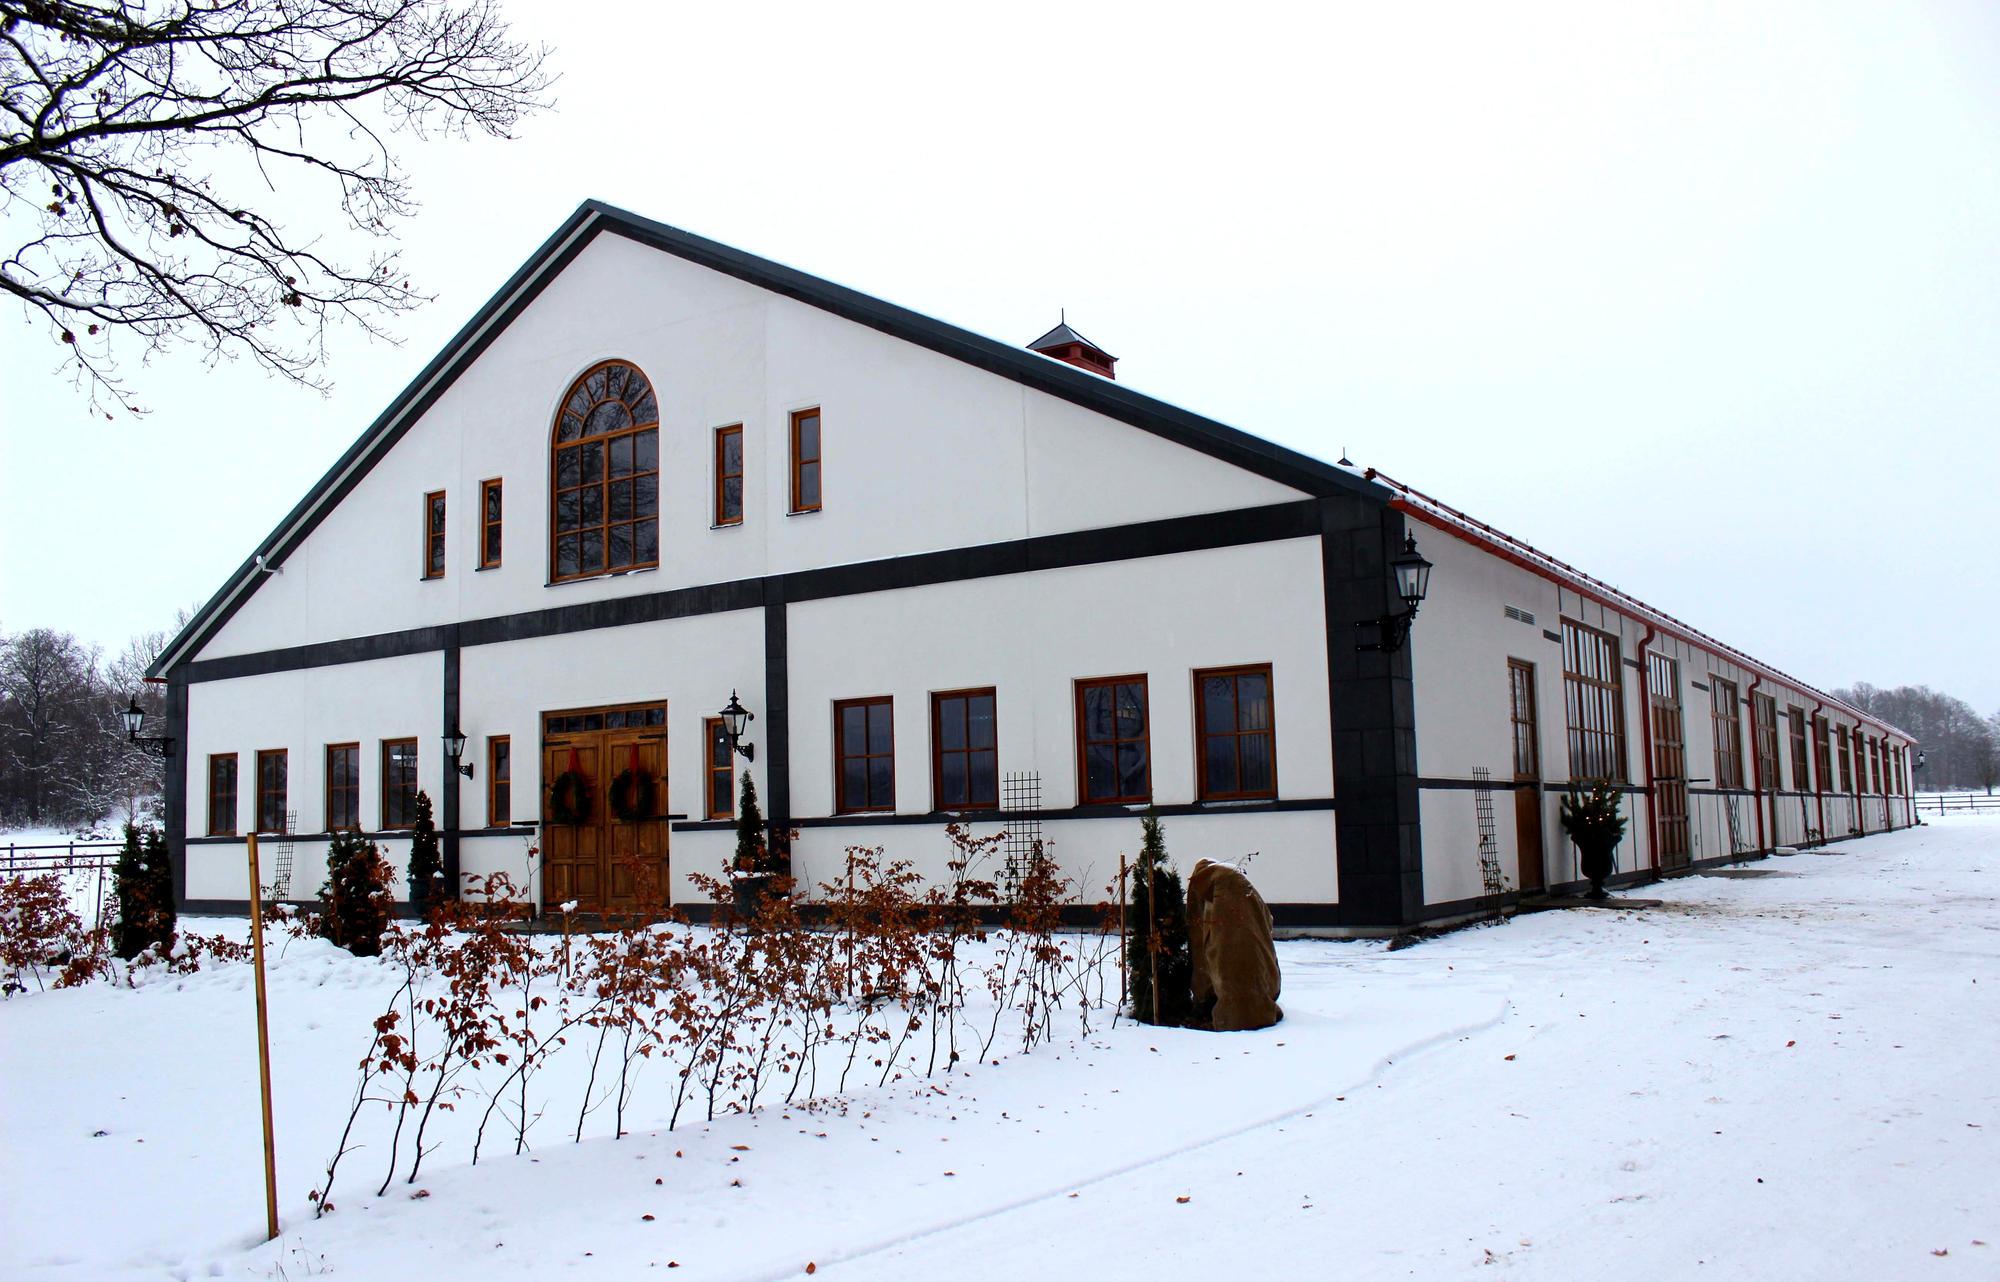 Nyinflyttade p Frskers brygga 10, Vsters | satisfaction-survey.net